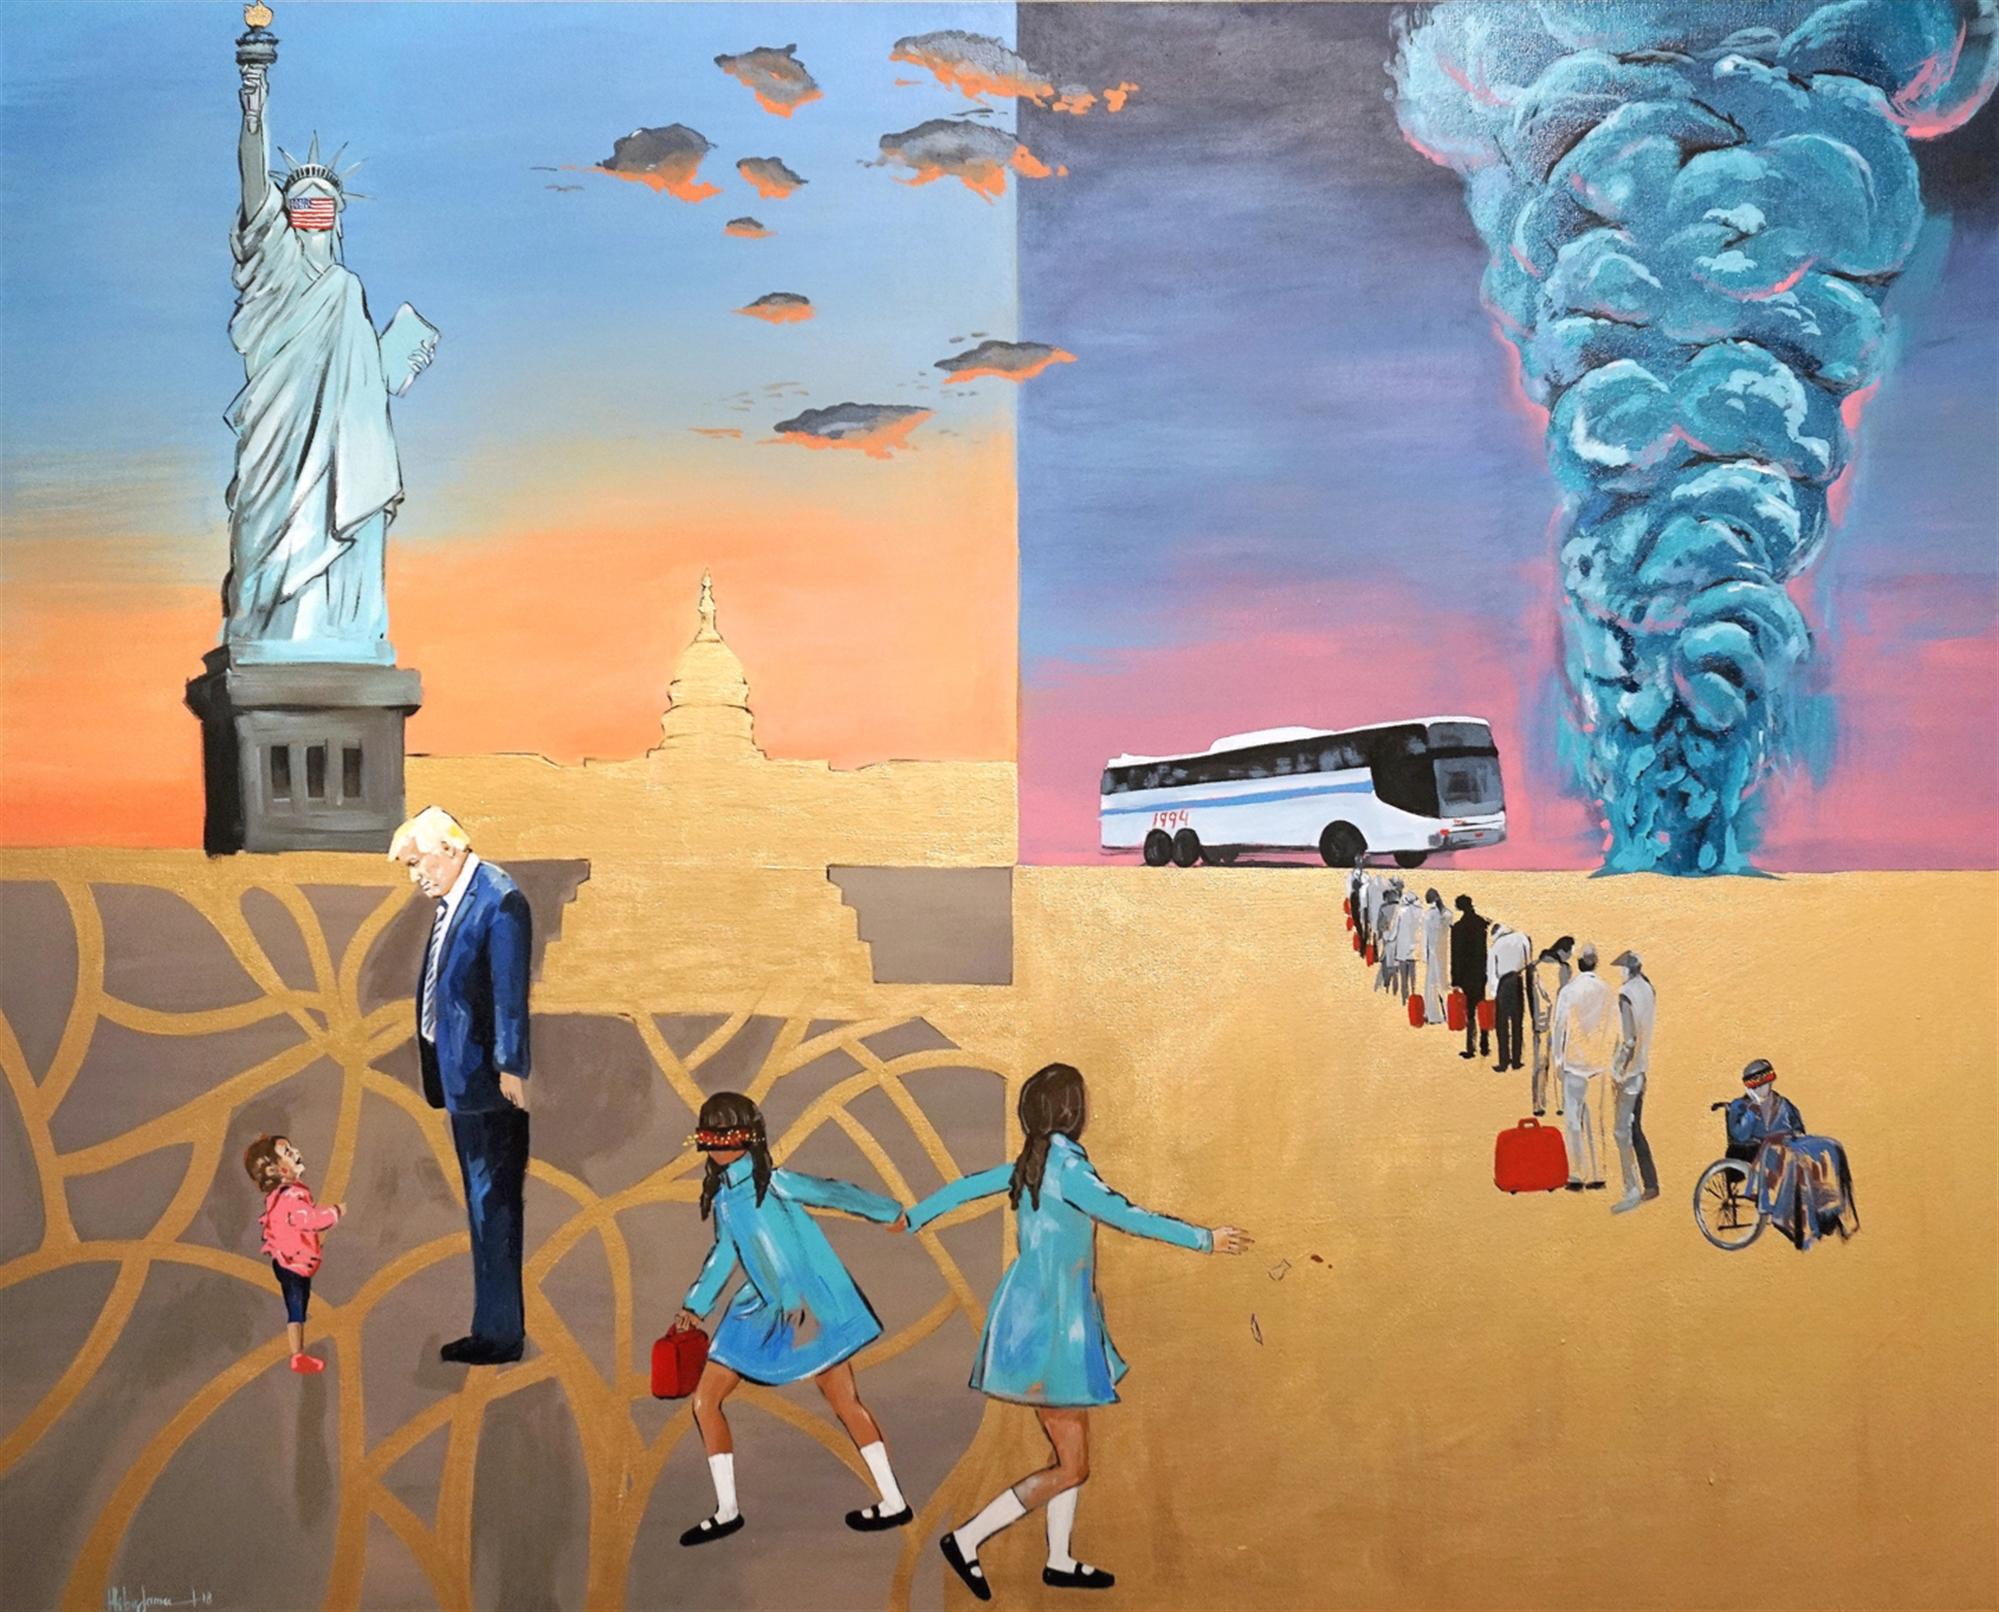 Time Travel in Mahjar by Hiba Jameel